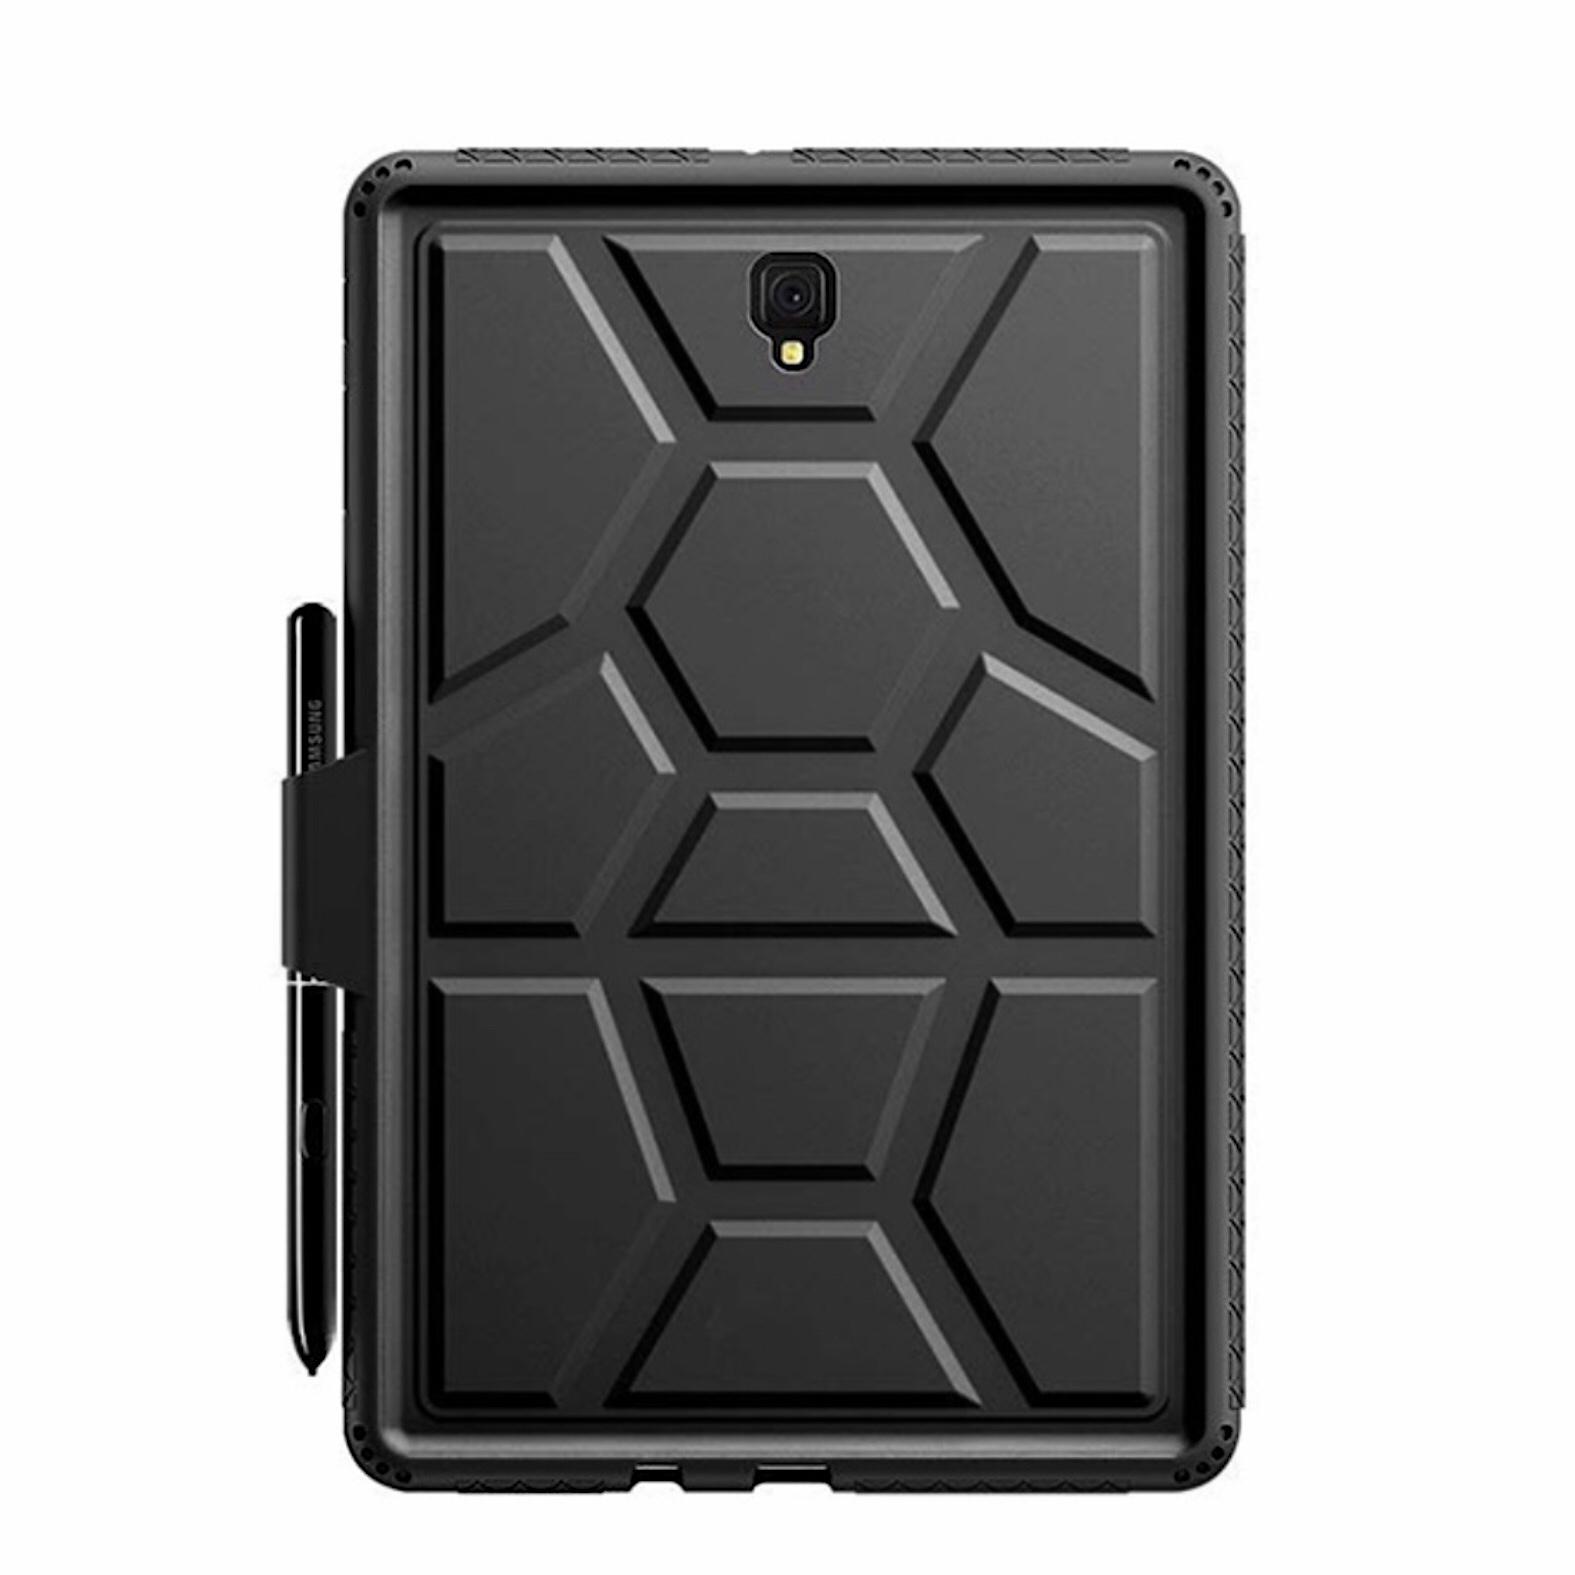 Bundle 2 en 1 Coque Silicone Premium et verre de protection ecran Galaxy TAB S4 10.5 pouces